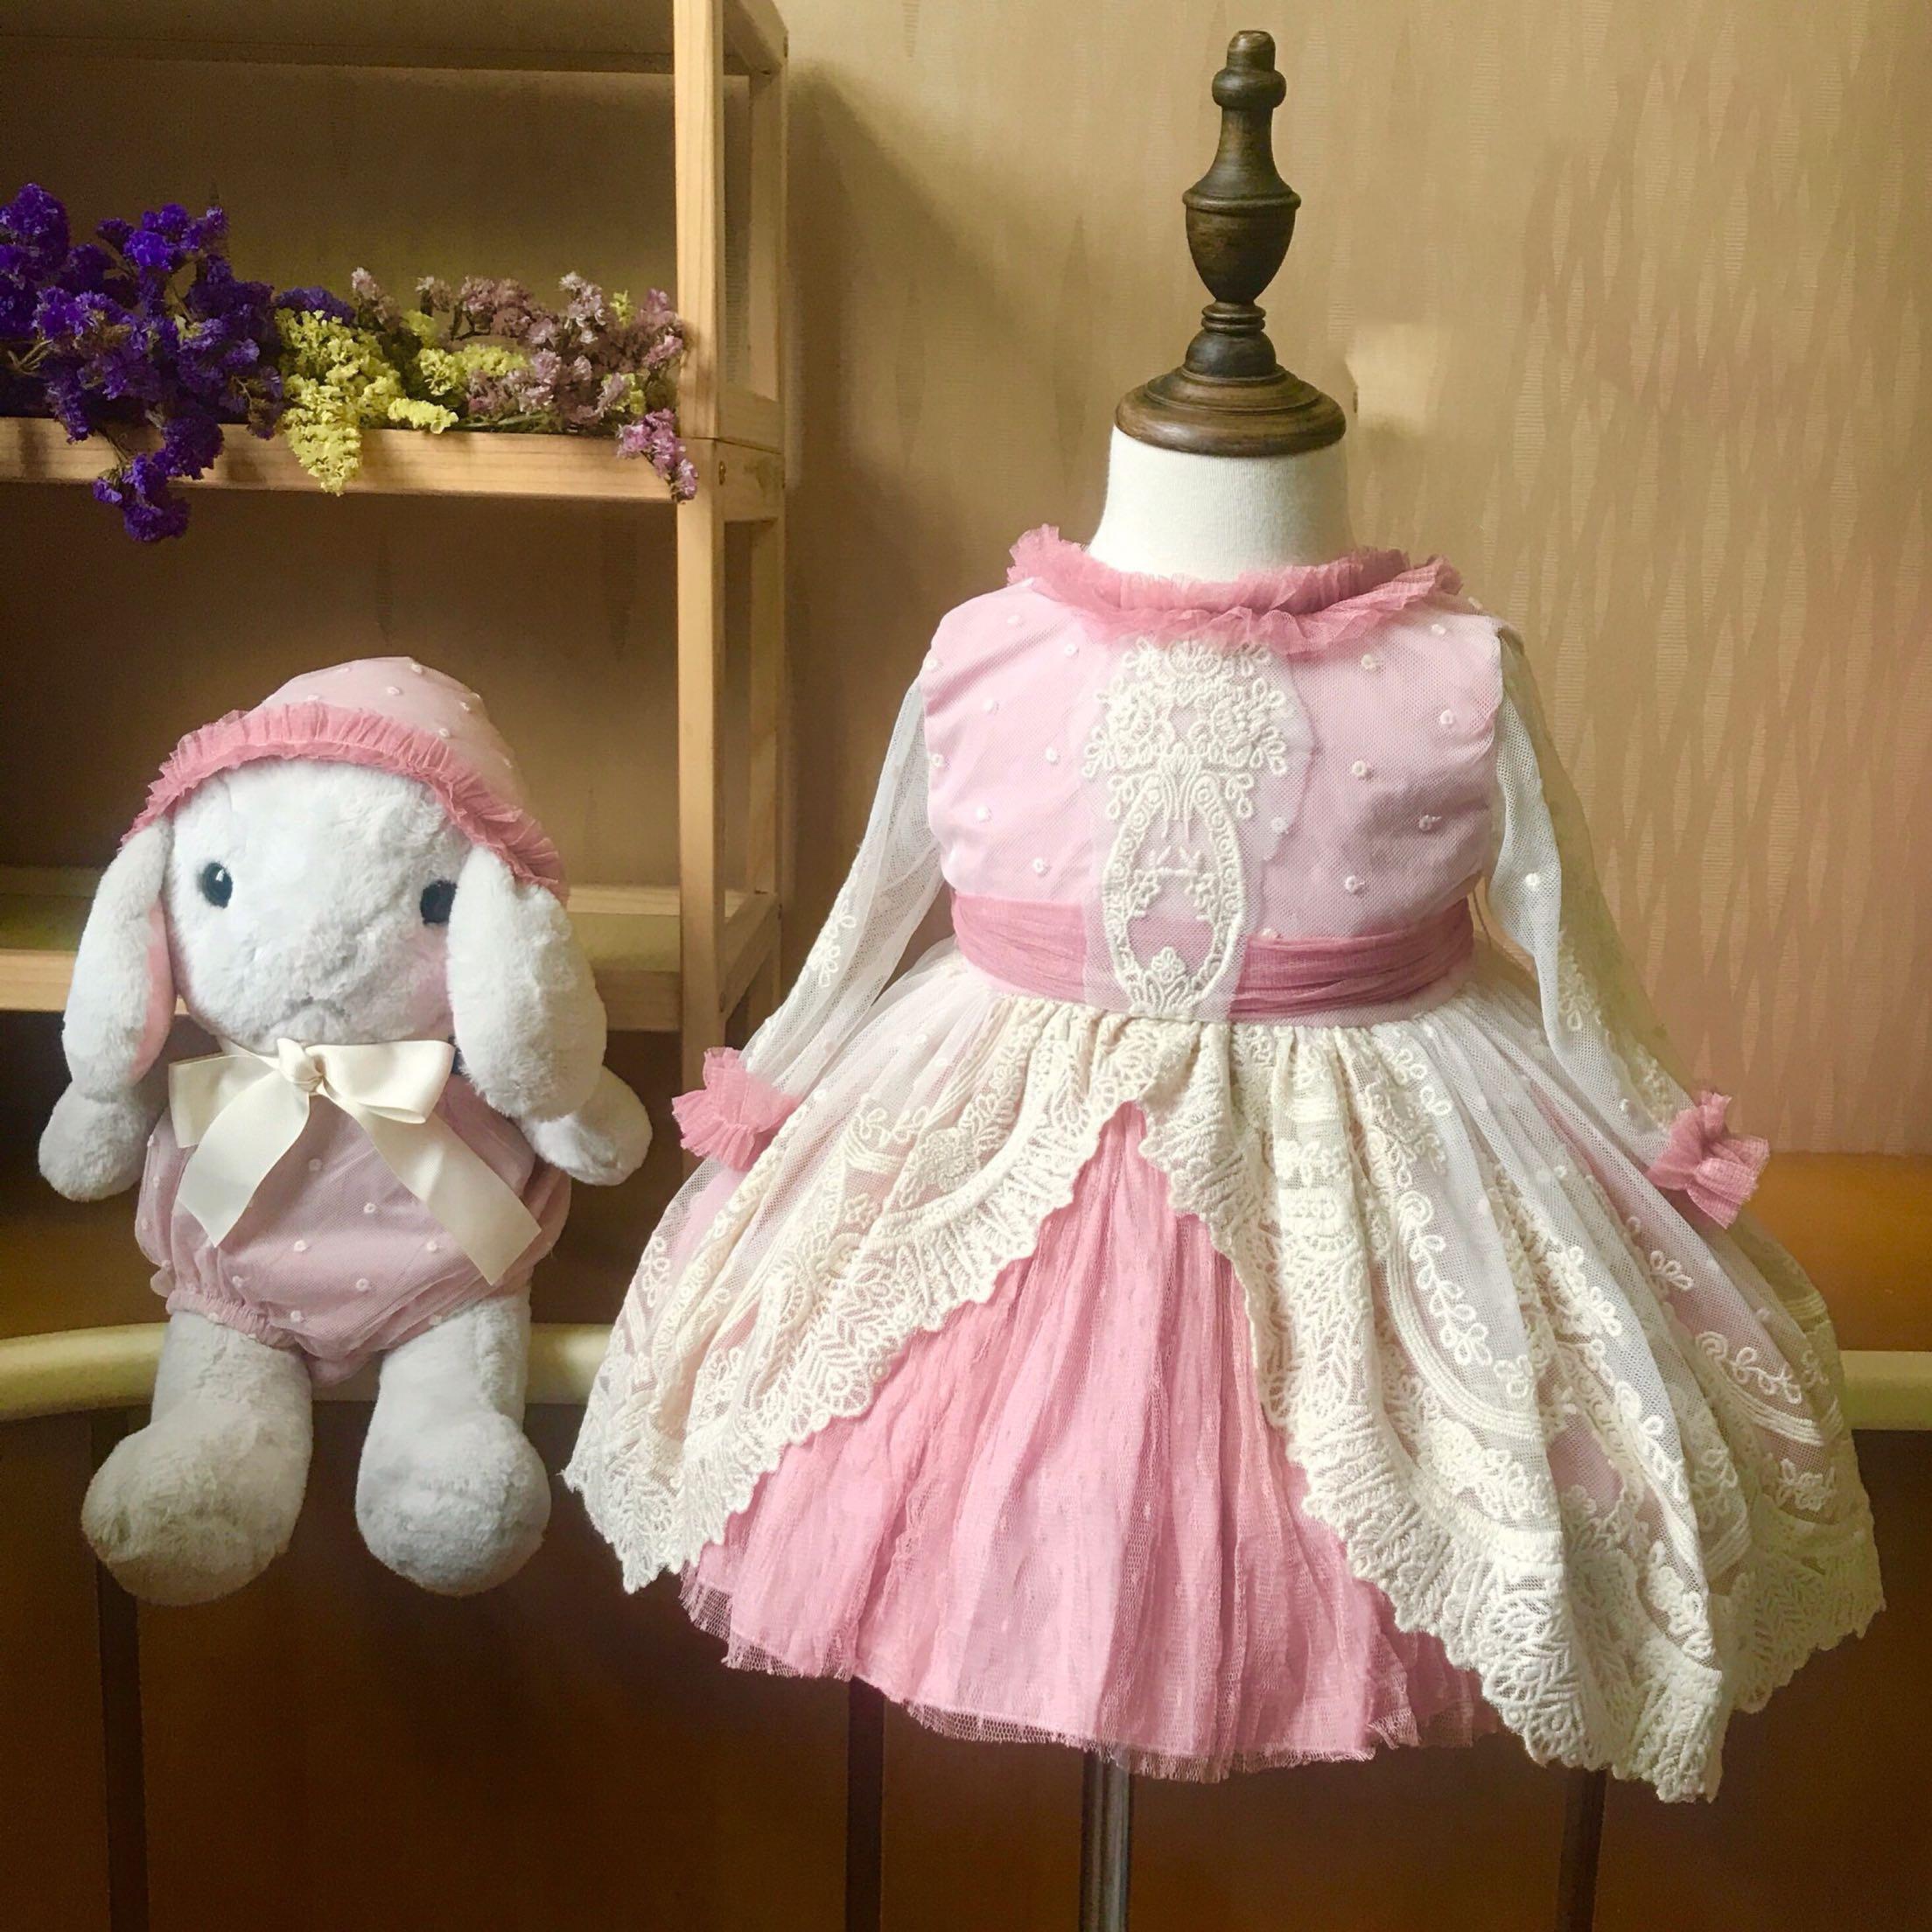 Baby Boutique Clothing Girls Dresses Children Birthday Dress Set Pink Lace Spanish Style Frocks Infant Baptism